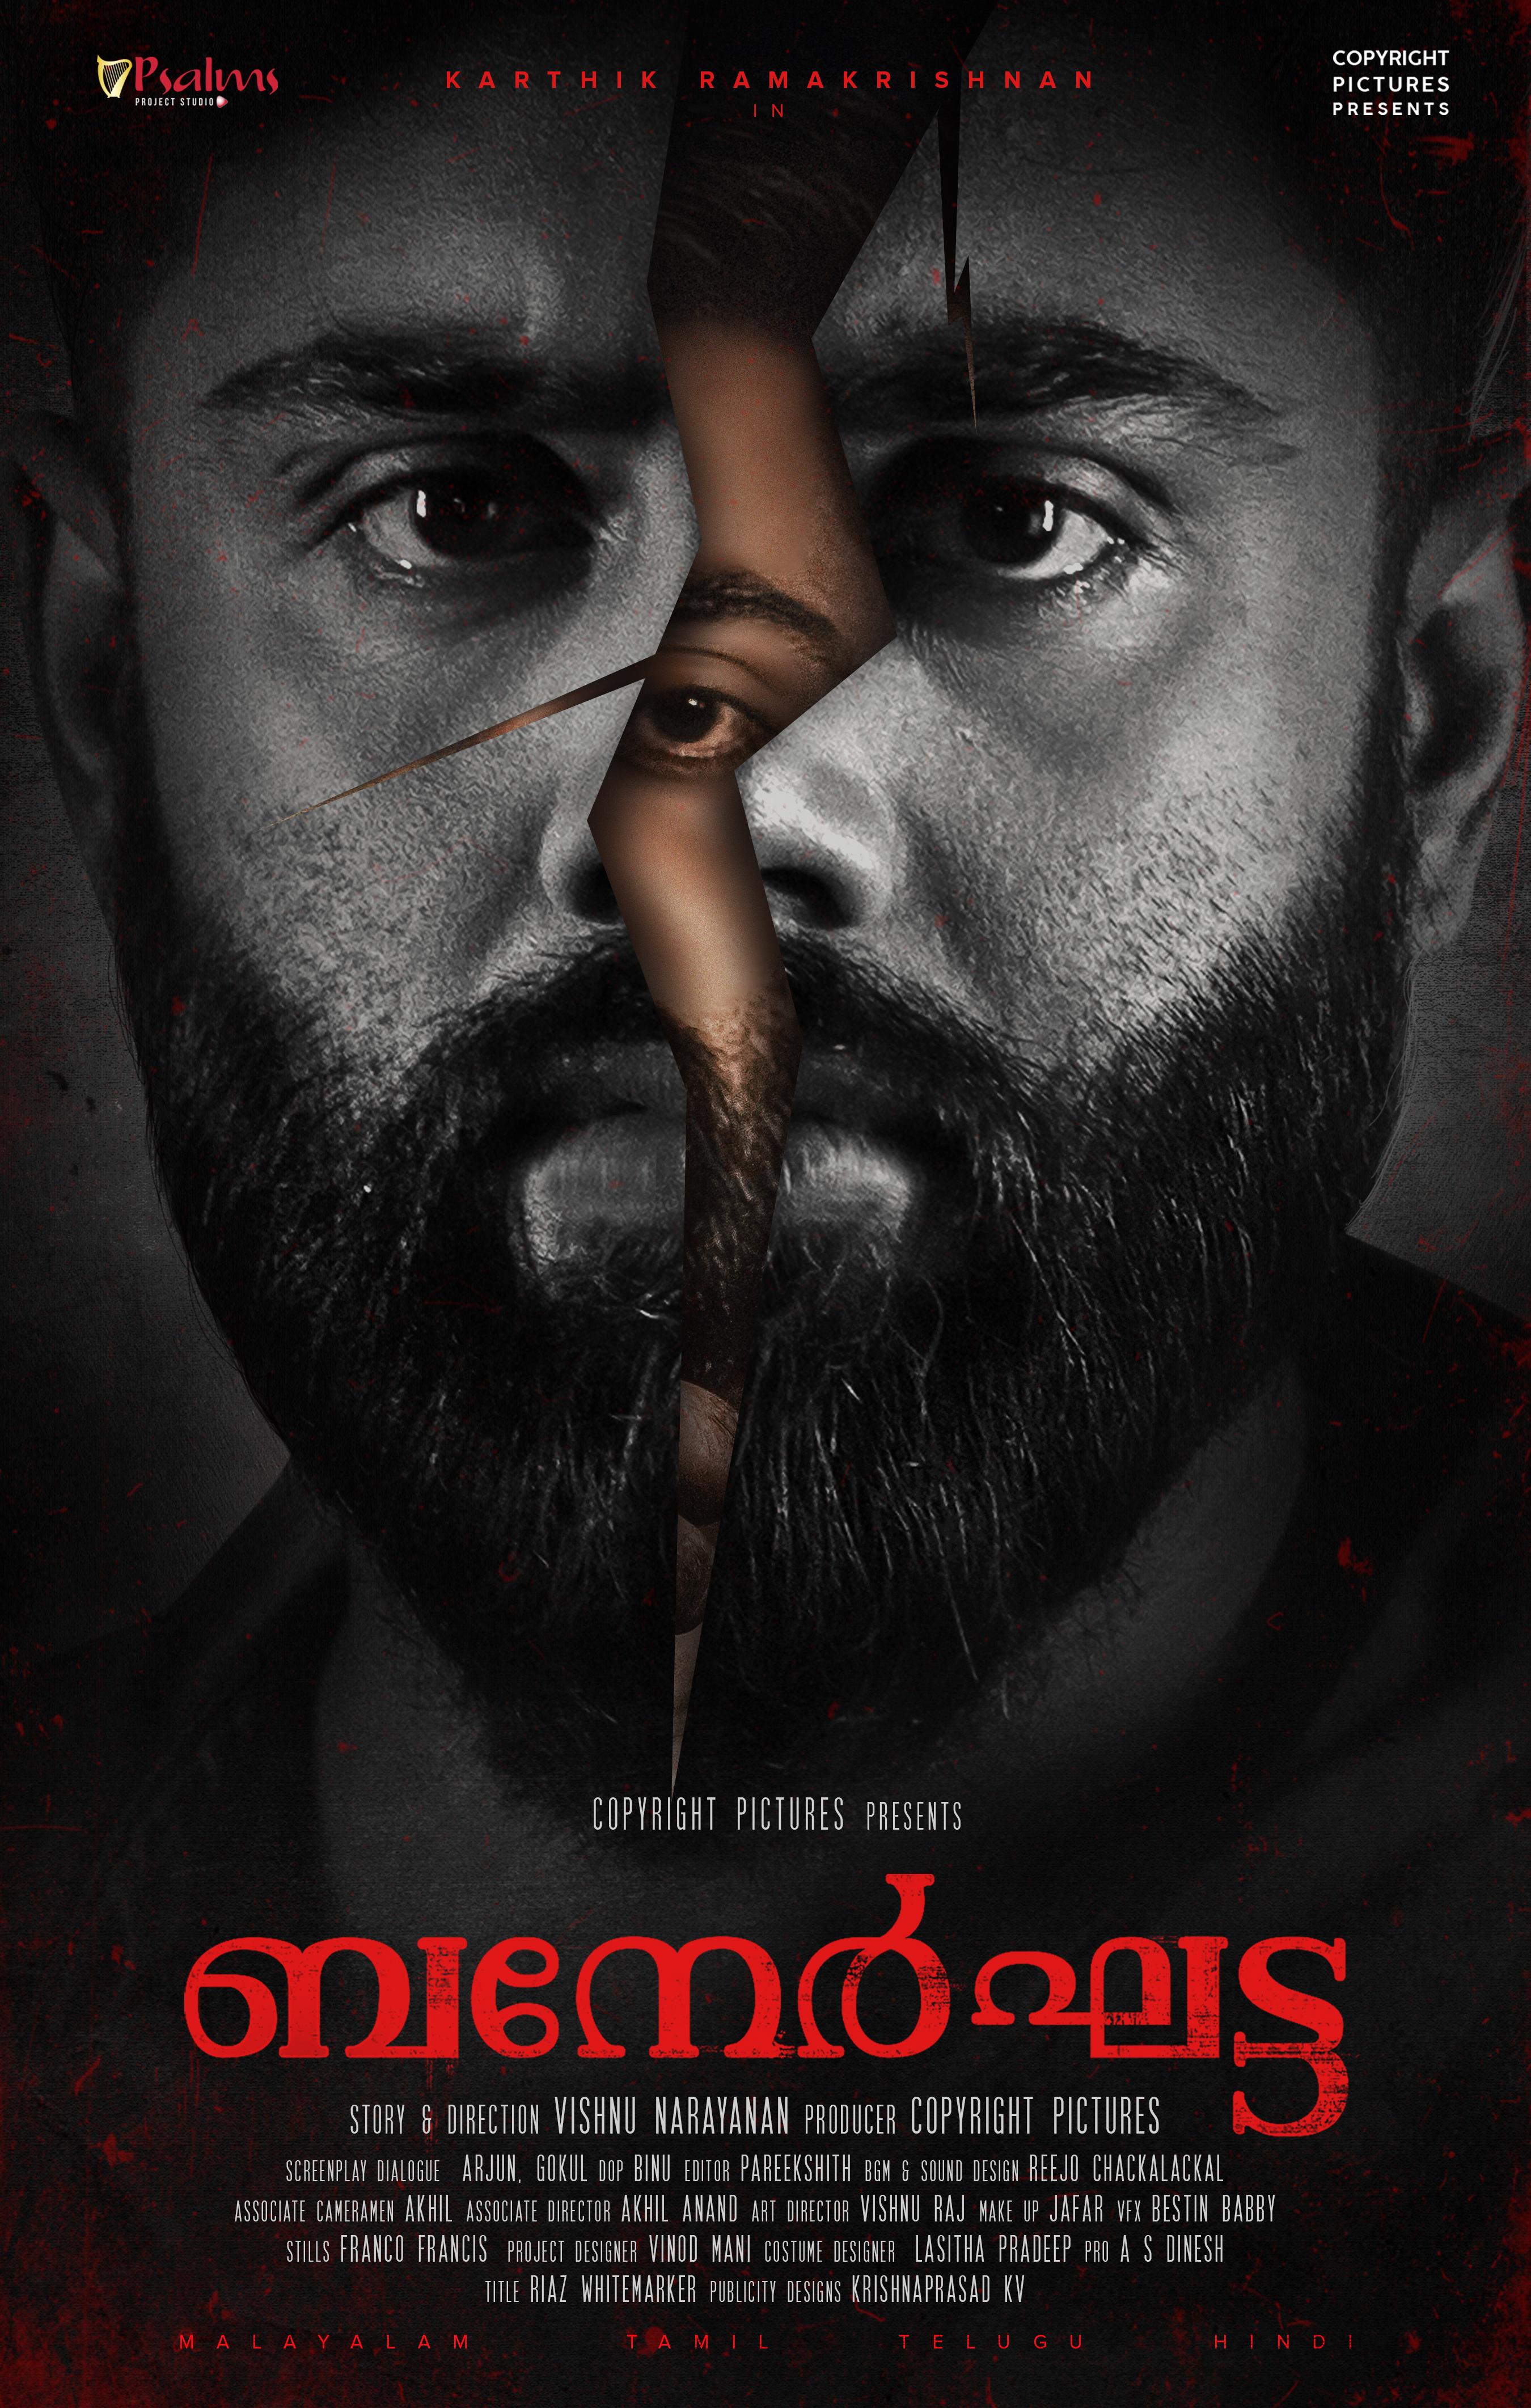 Bannerghatta (2021) Malayalam Crime+Horror Movie